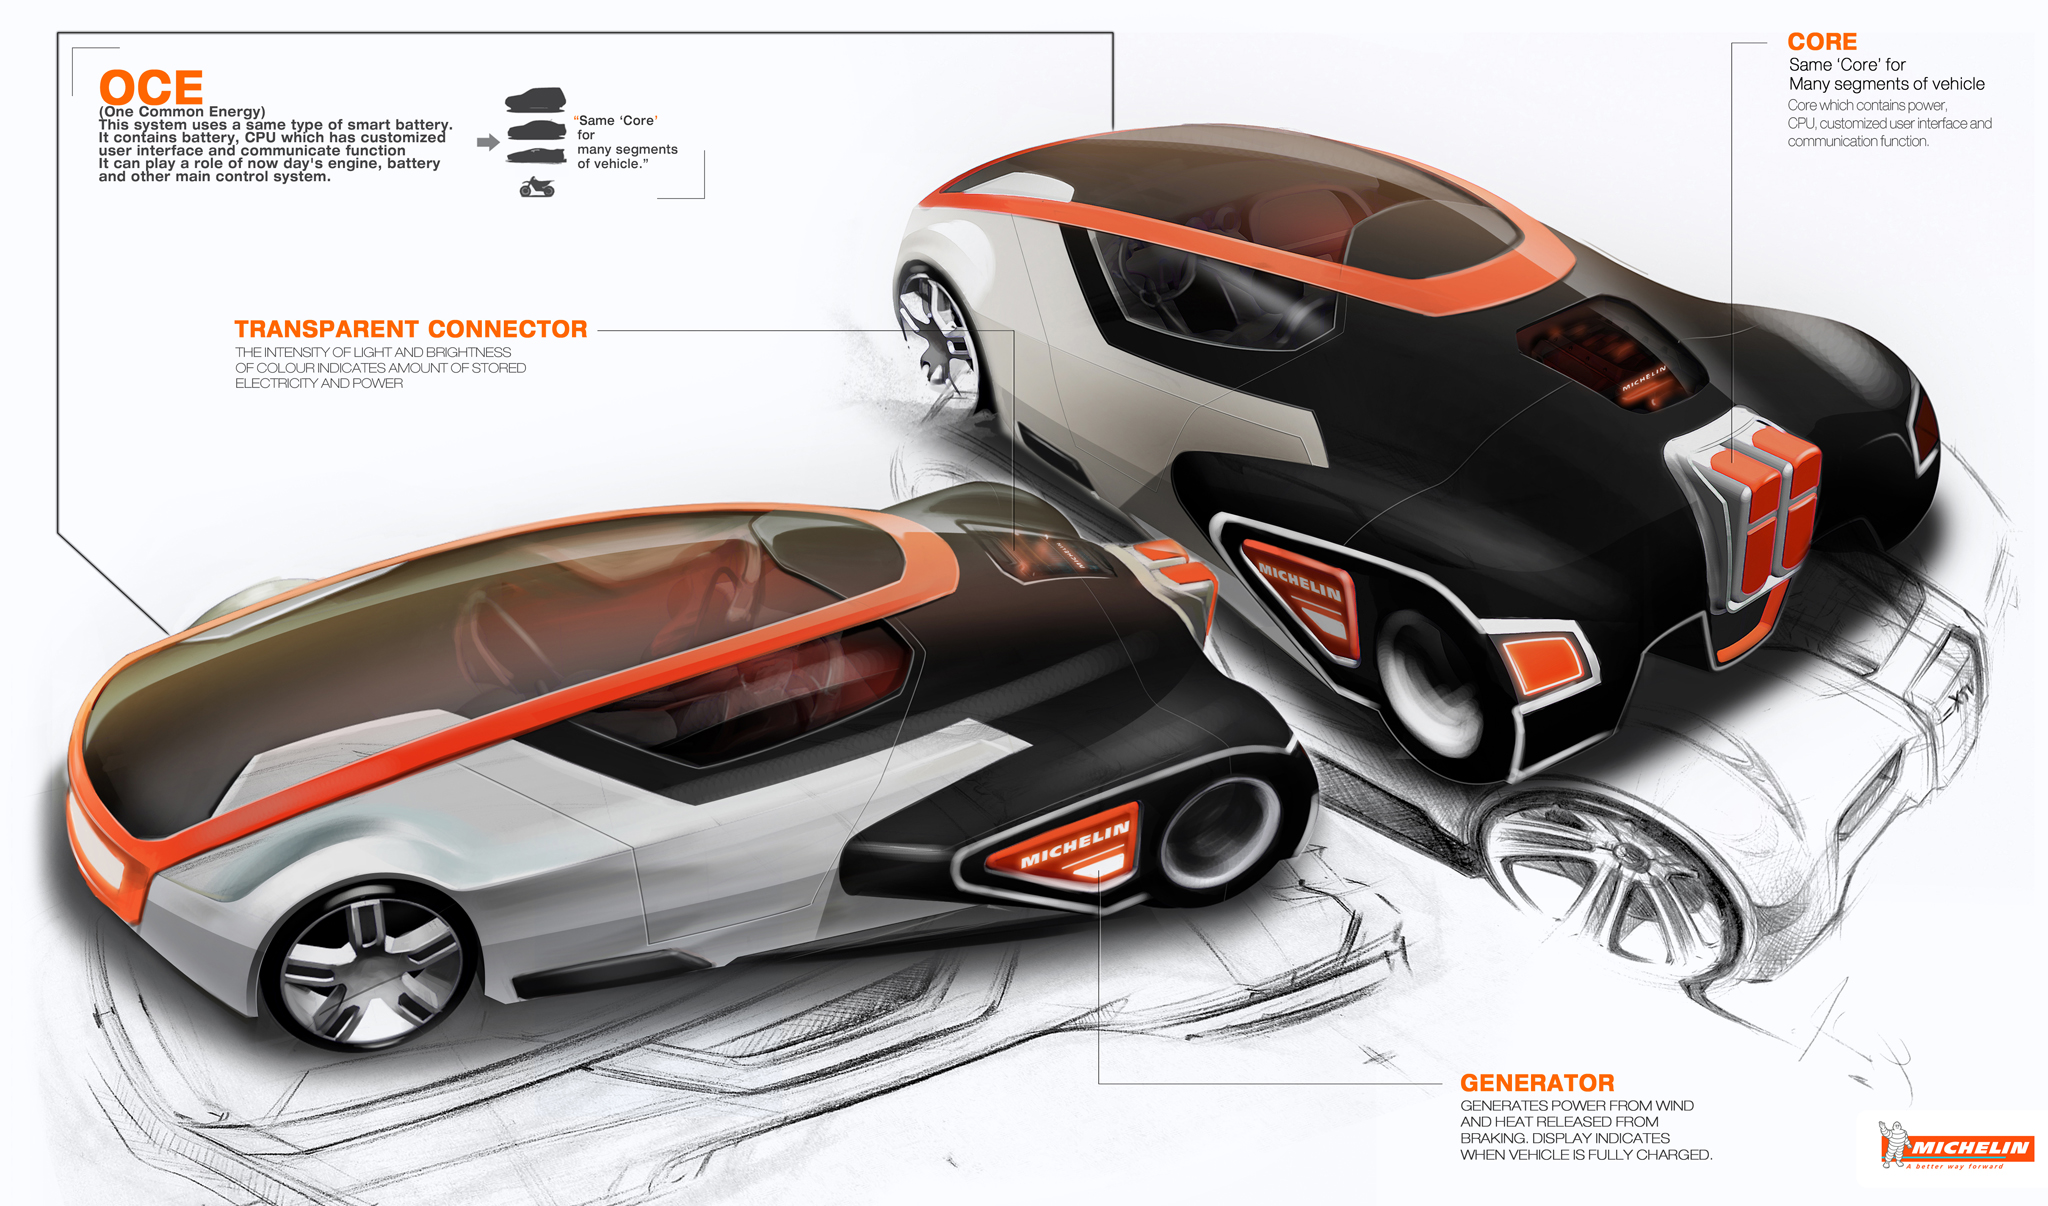 Oce By Yongbang Ho South Korea Michelin Challenge Design